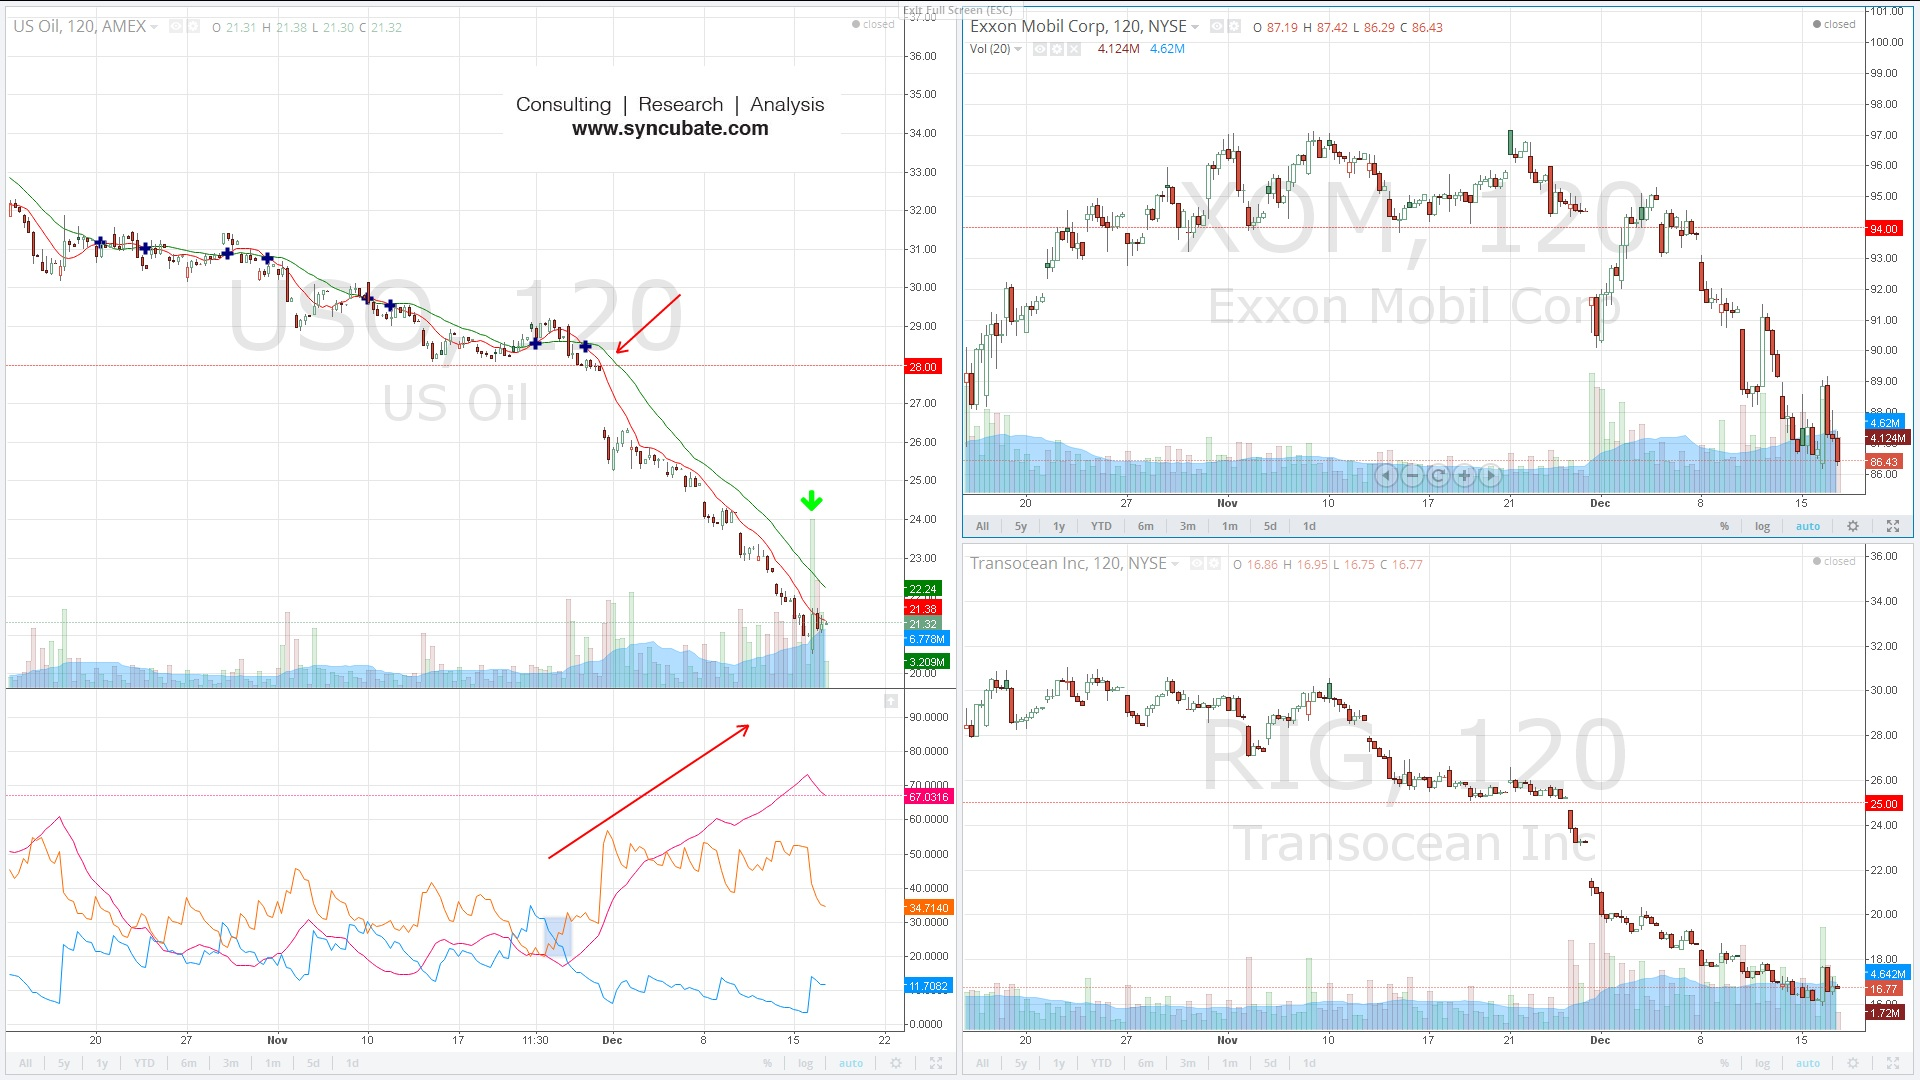 $USO : United States Oil Fund ETF; $XOM : Exxon Mobil Corp. ; $RIG : Transocean Ltd.